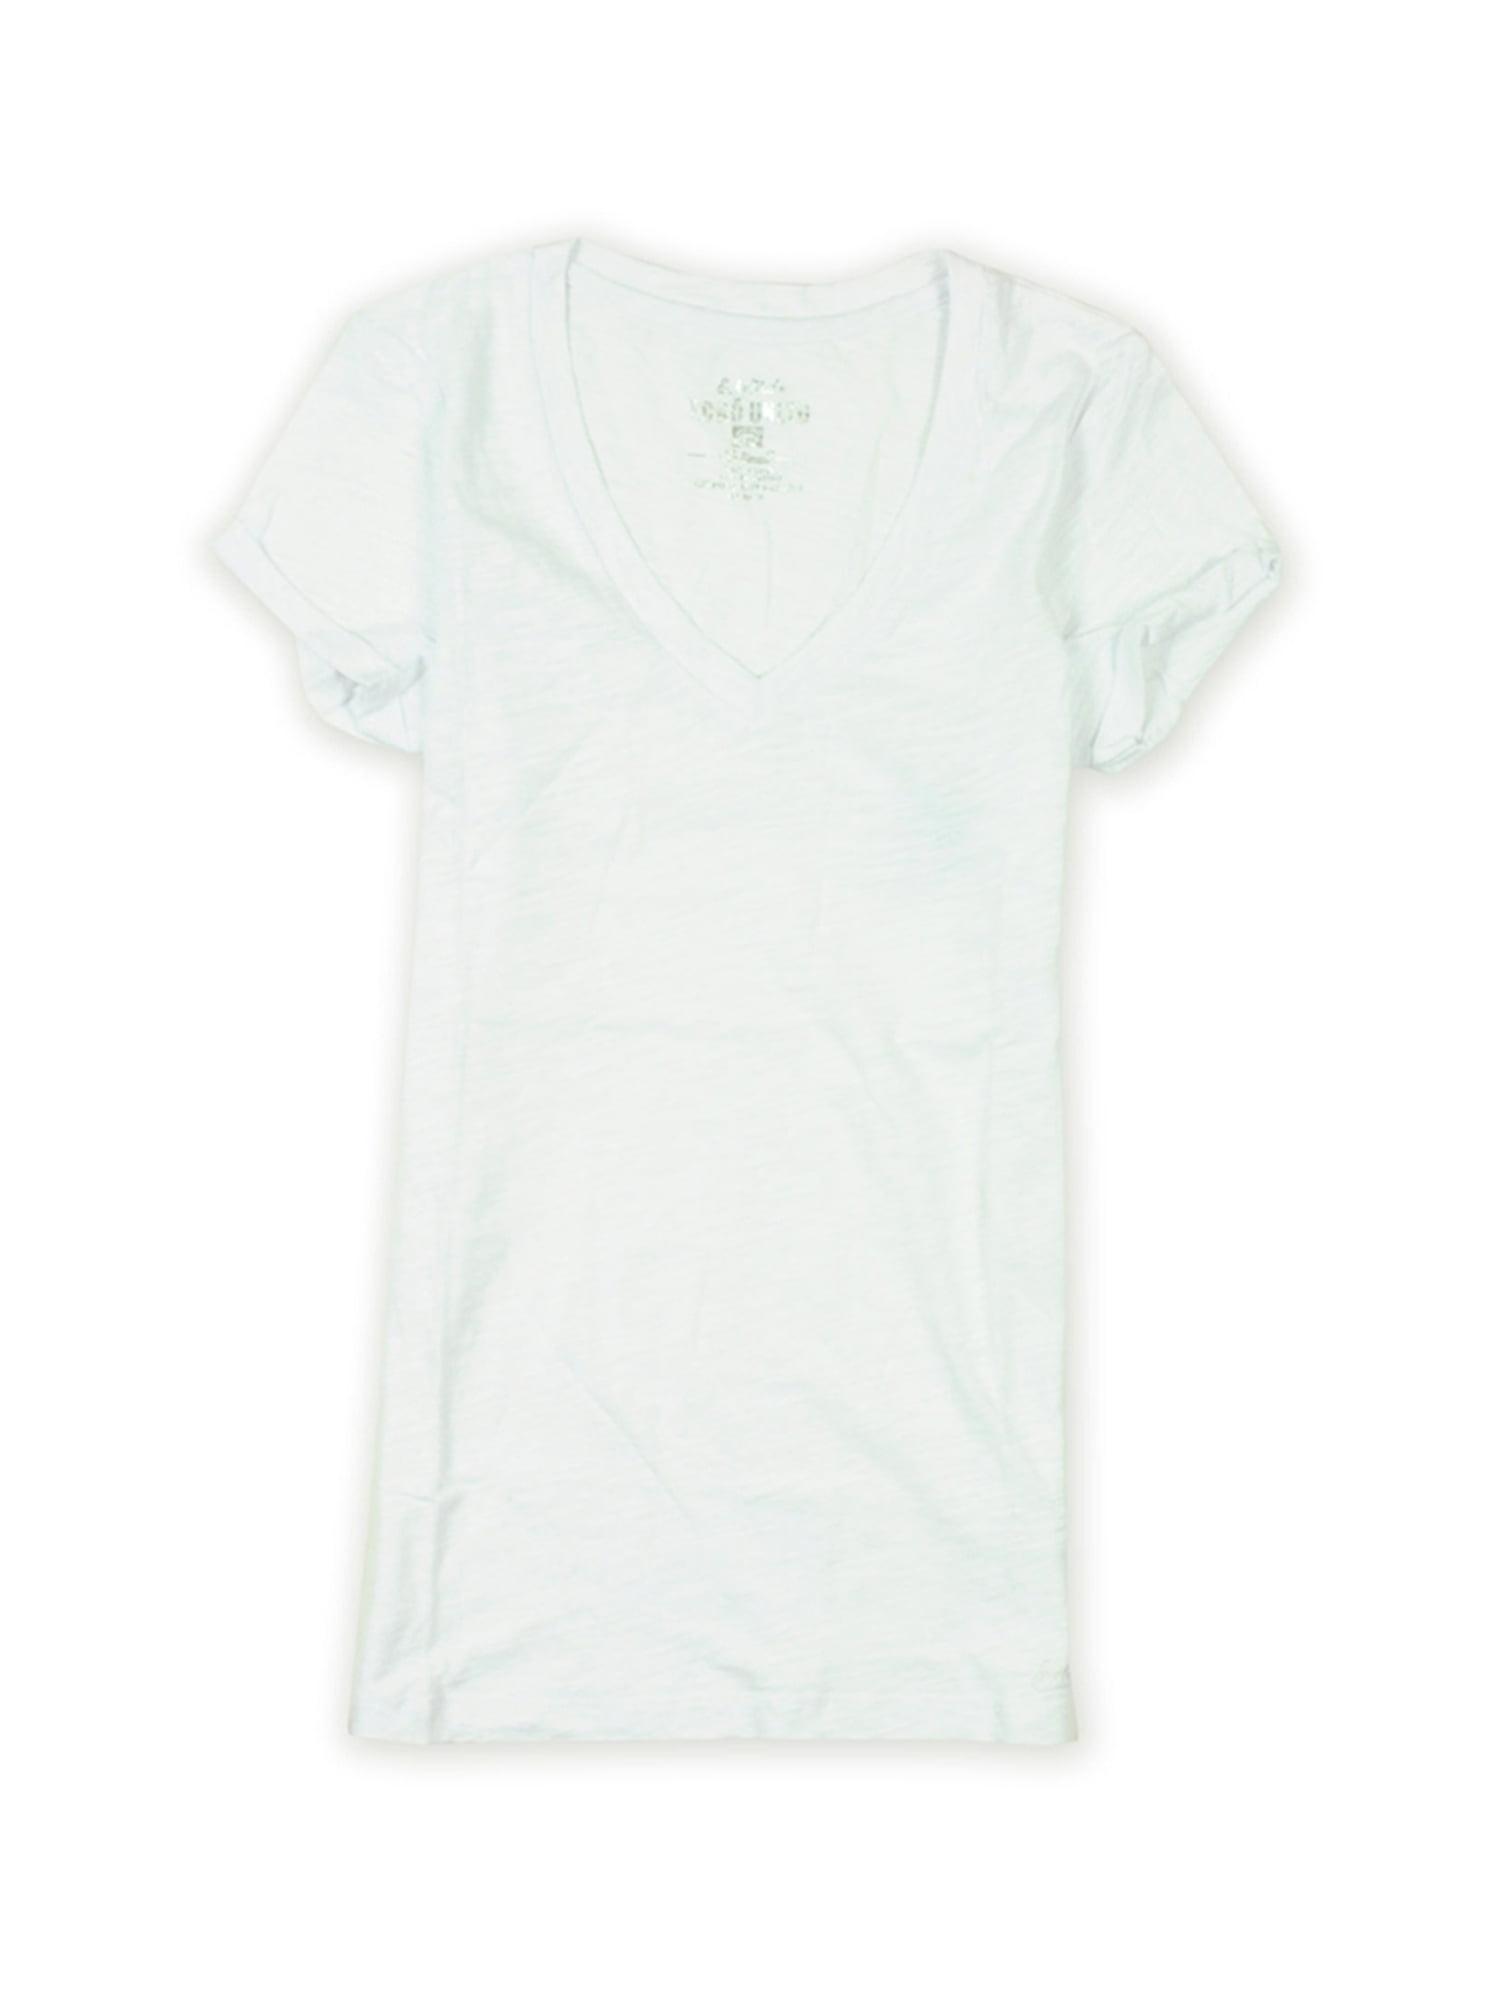 Ecko Unltd Womens Stripe Slub Graphic T-Shirt truekord M